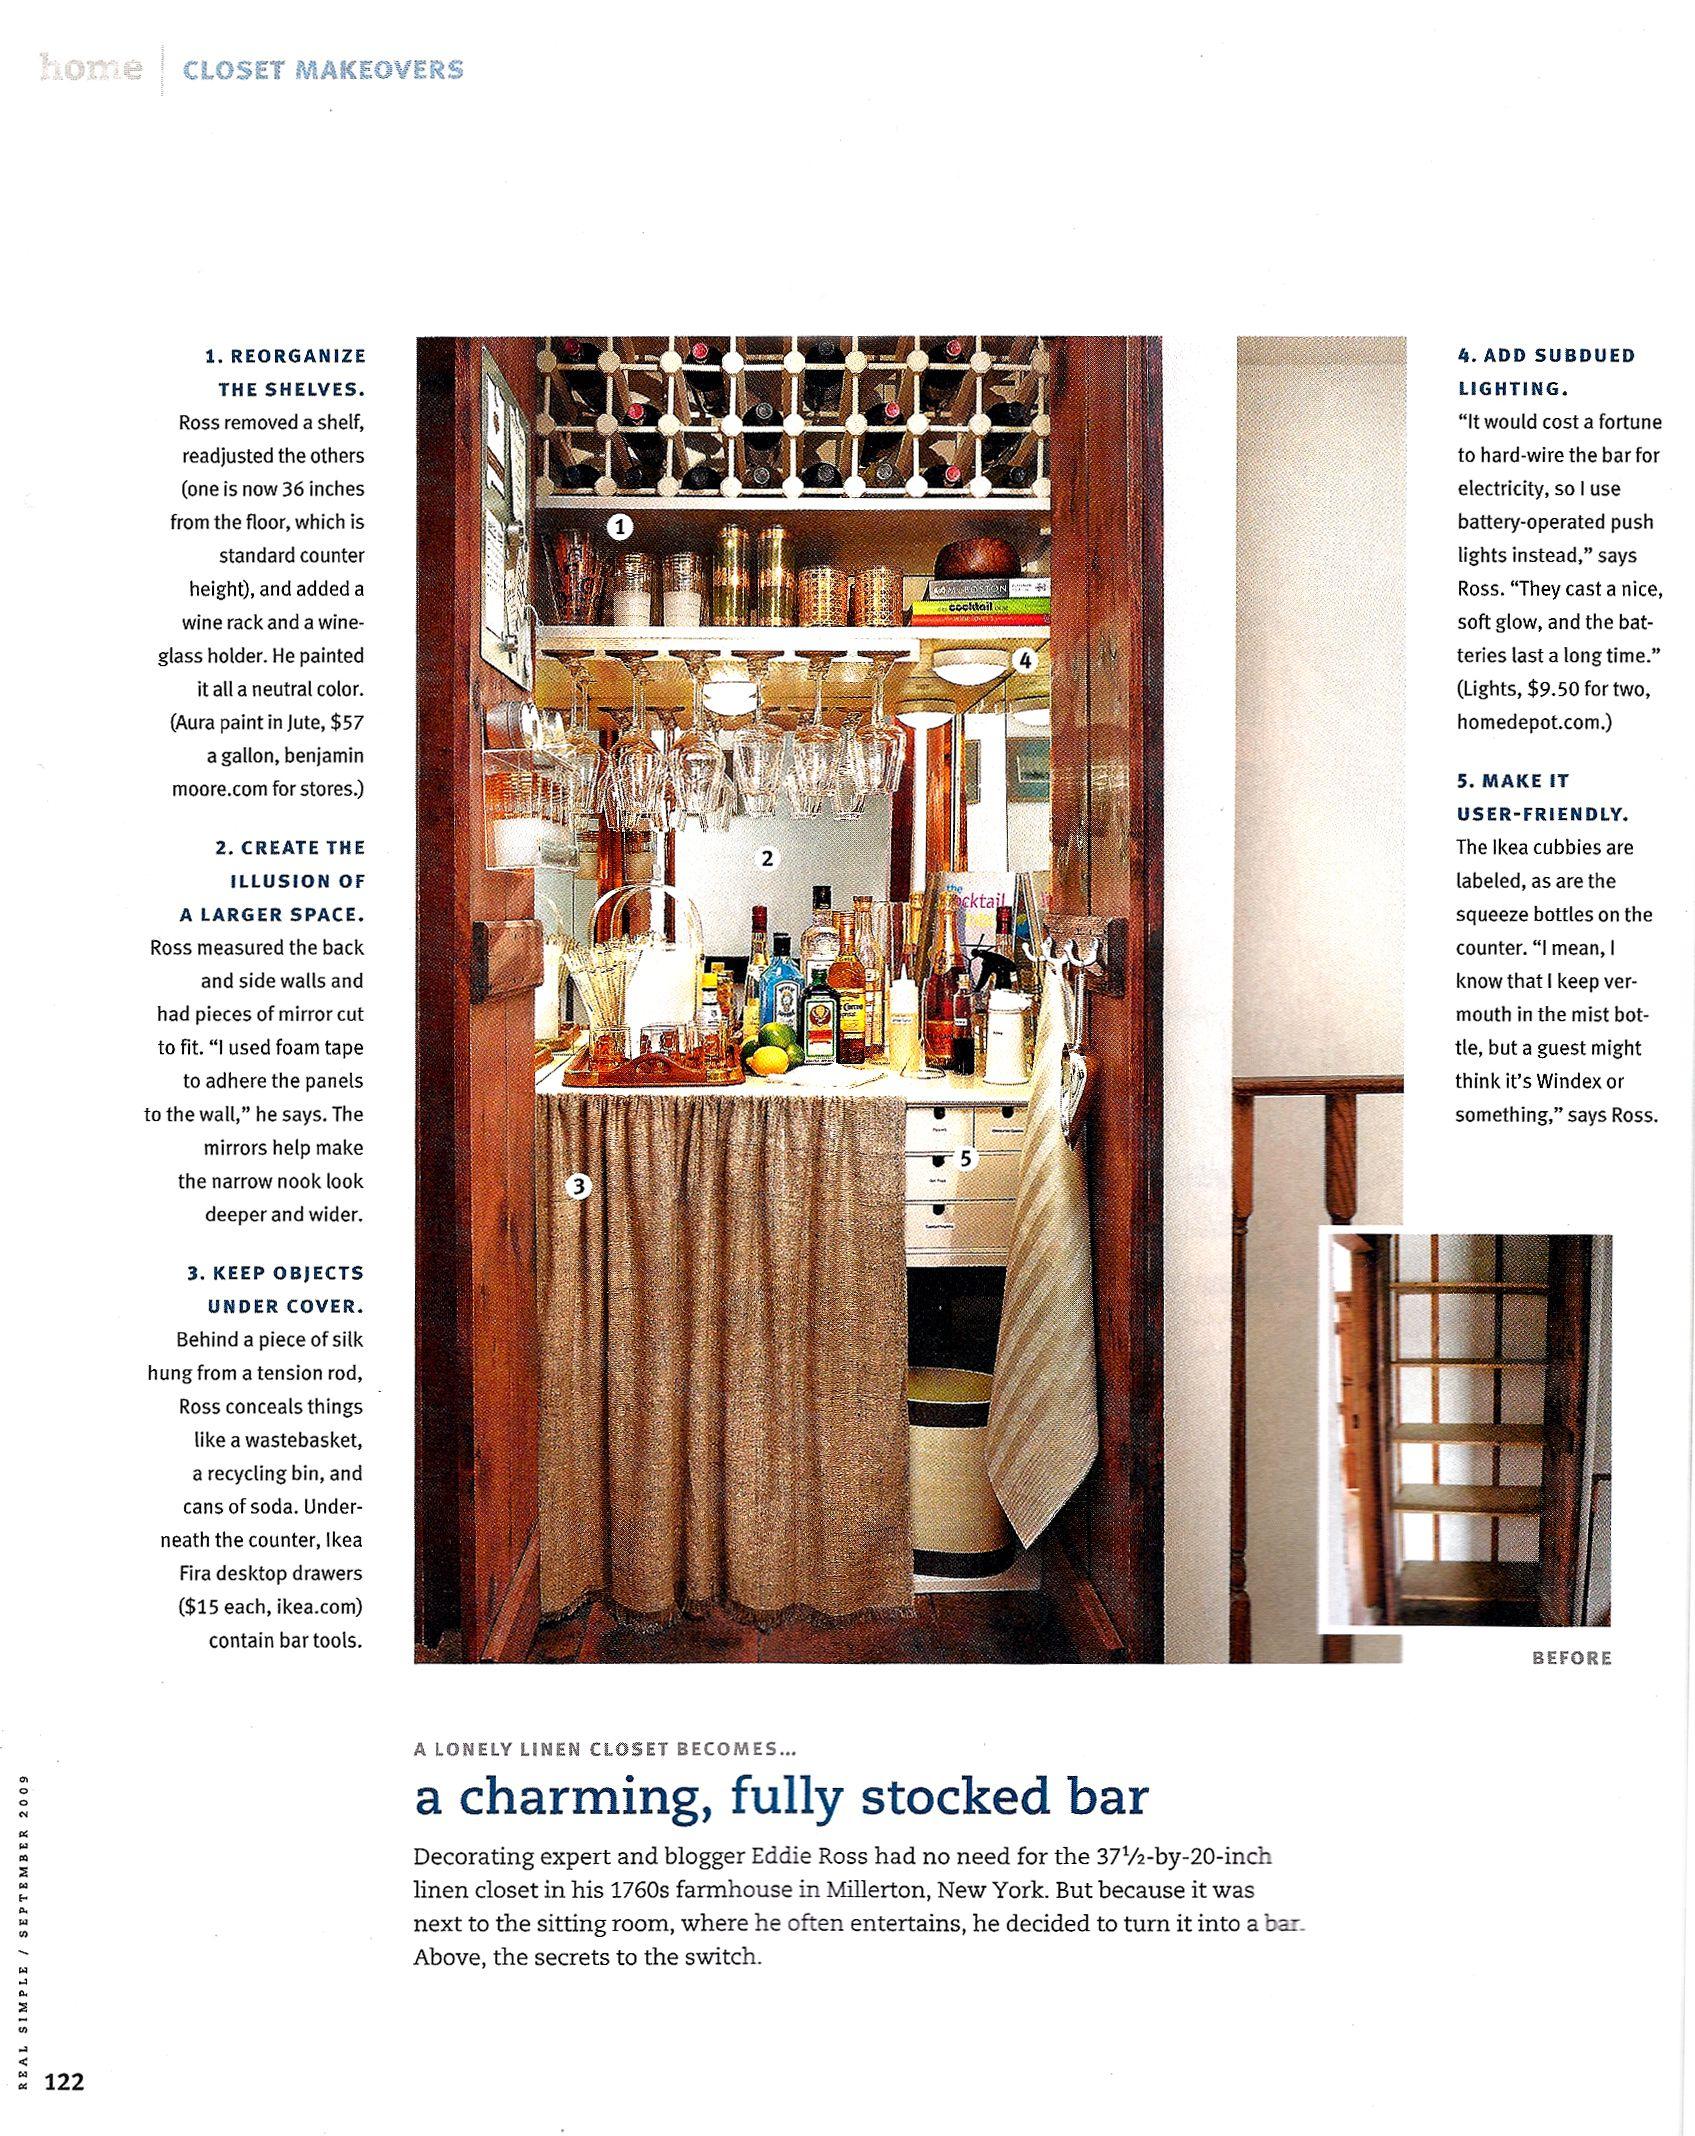 Convert A Closet Into Fully Stocked Bar Man